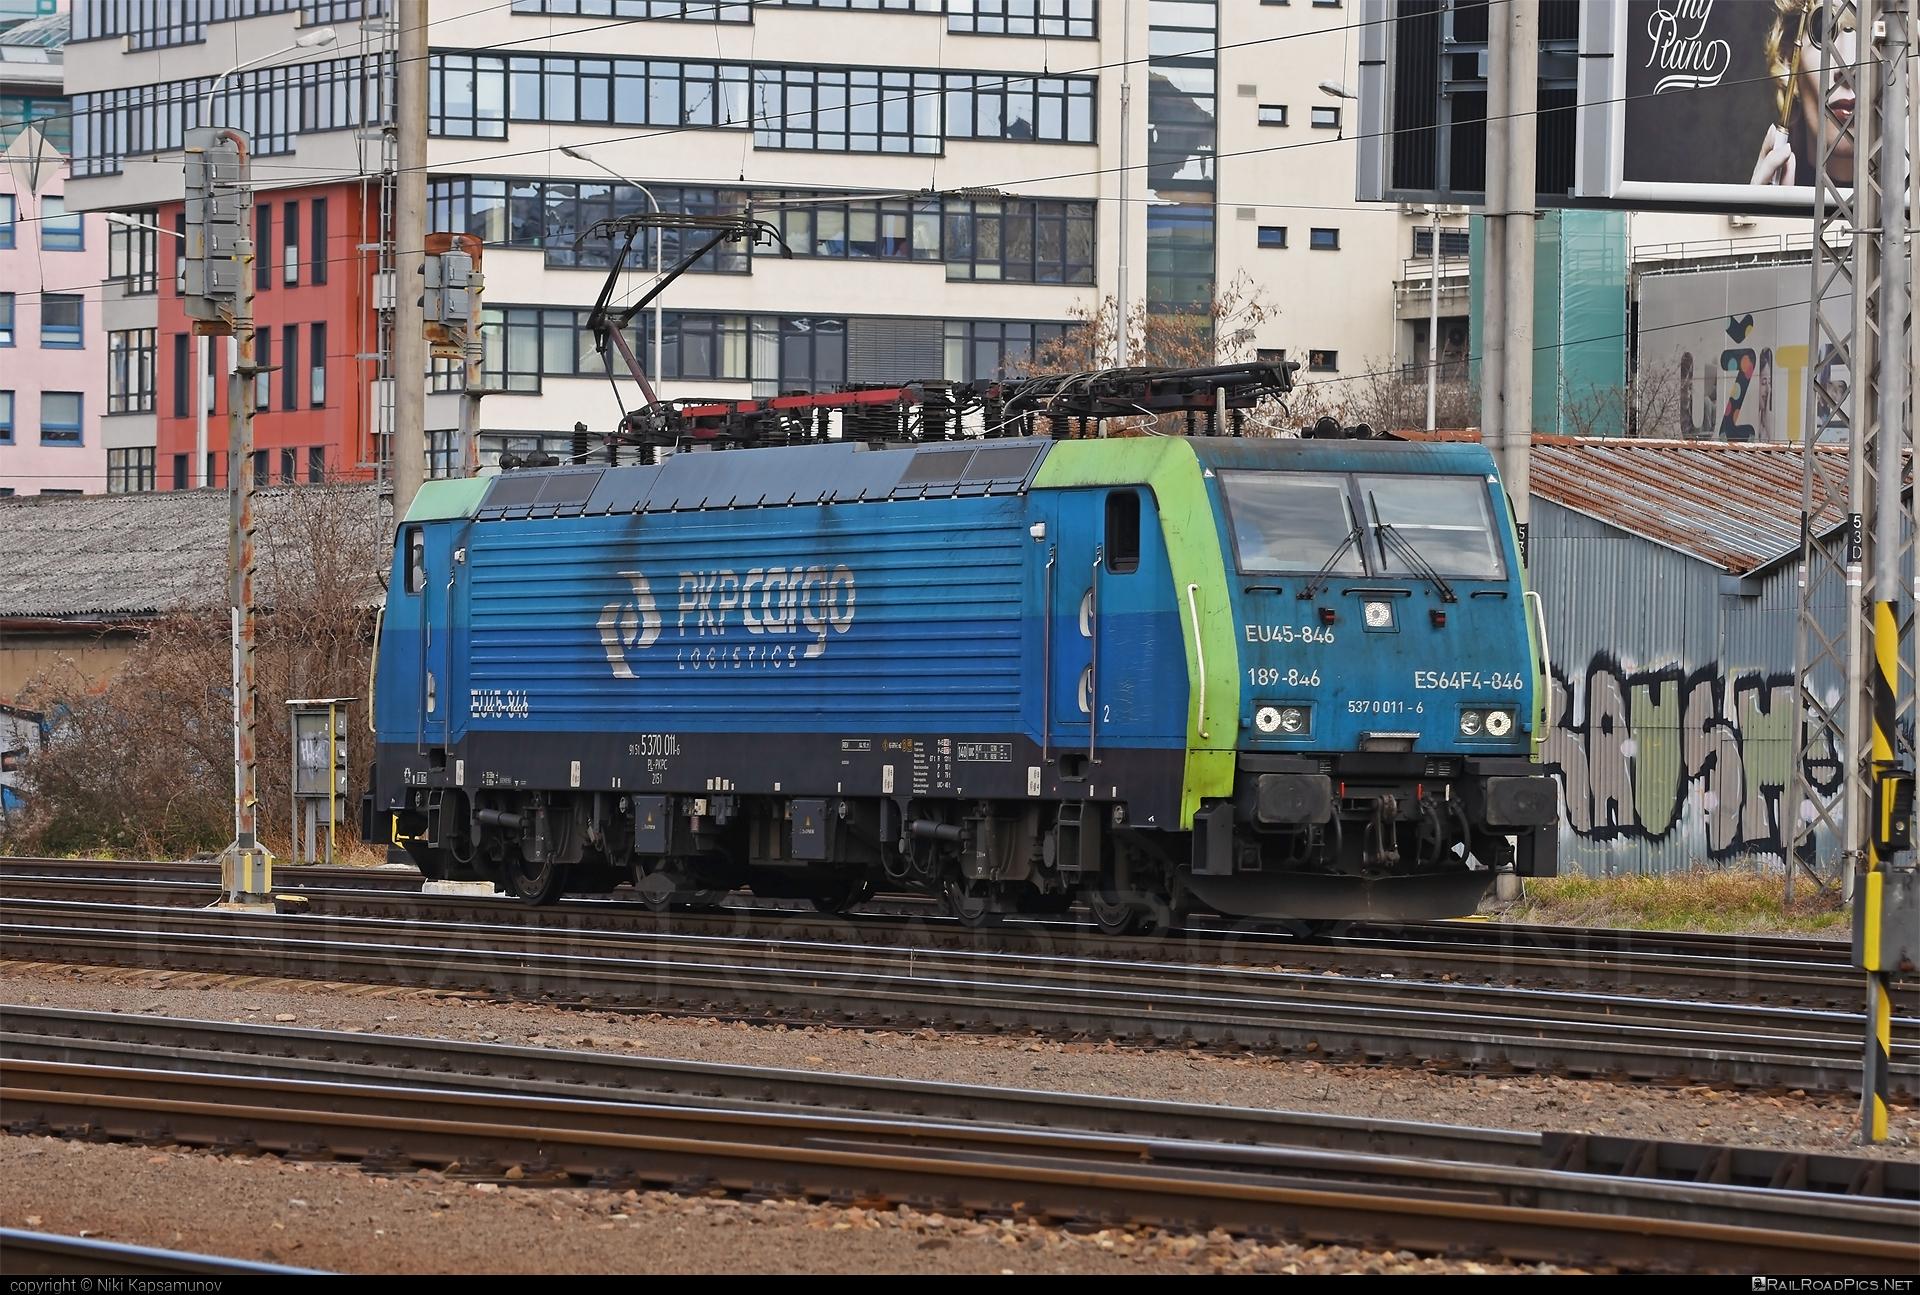 Siemens ES 64 F4 - 5370 011-6 operated by PKP CARGO Spólka Akcyjna #es64 #es64f4 #eurosprinter #pkp #pkpcargo #pkpcargospolkaakcyjna #siemens #siemenses64 #siemenses64f4